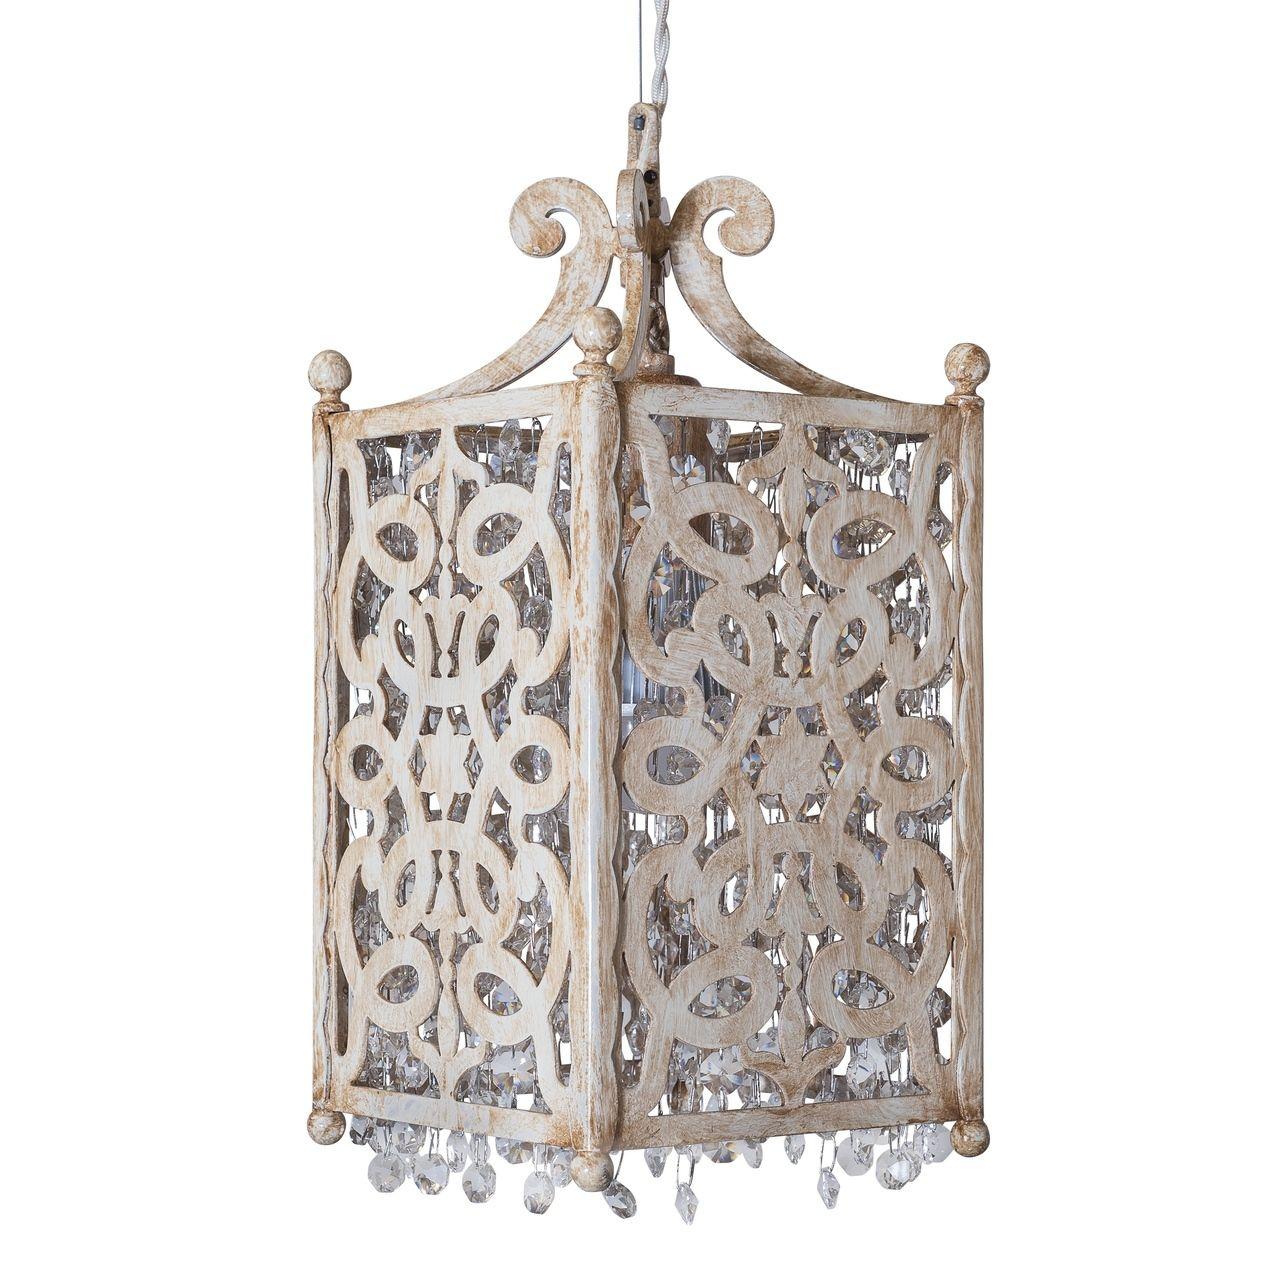 Persica custom handmade chandeliers light beautiful crystals persica custom handmade chandeliers light beautiful crystals fixtures arubaitofo Image collections